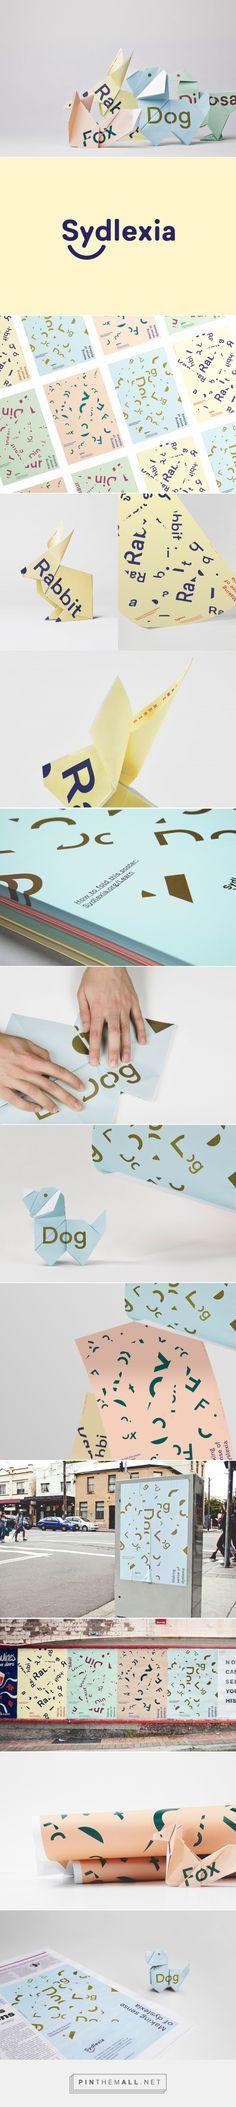 New Logo & Brand Identity for Sydlexia by BBDO Dubai — BP&O - created via https://pinthemall.net